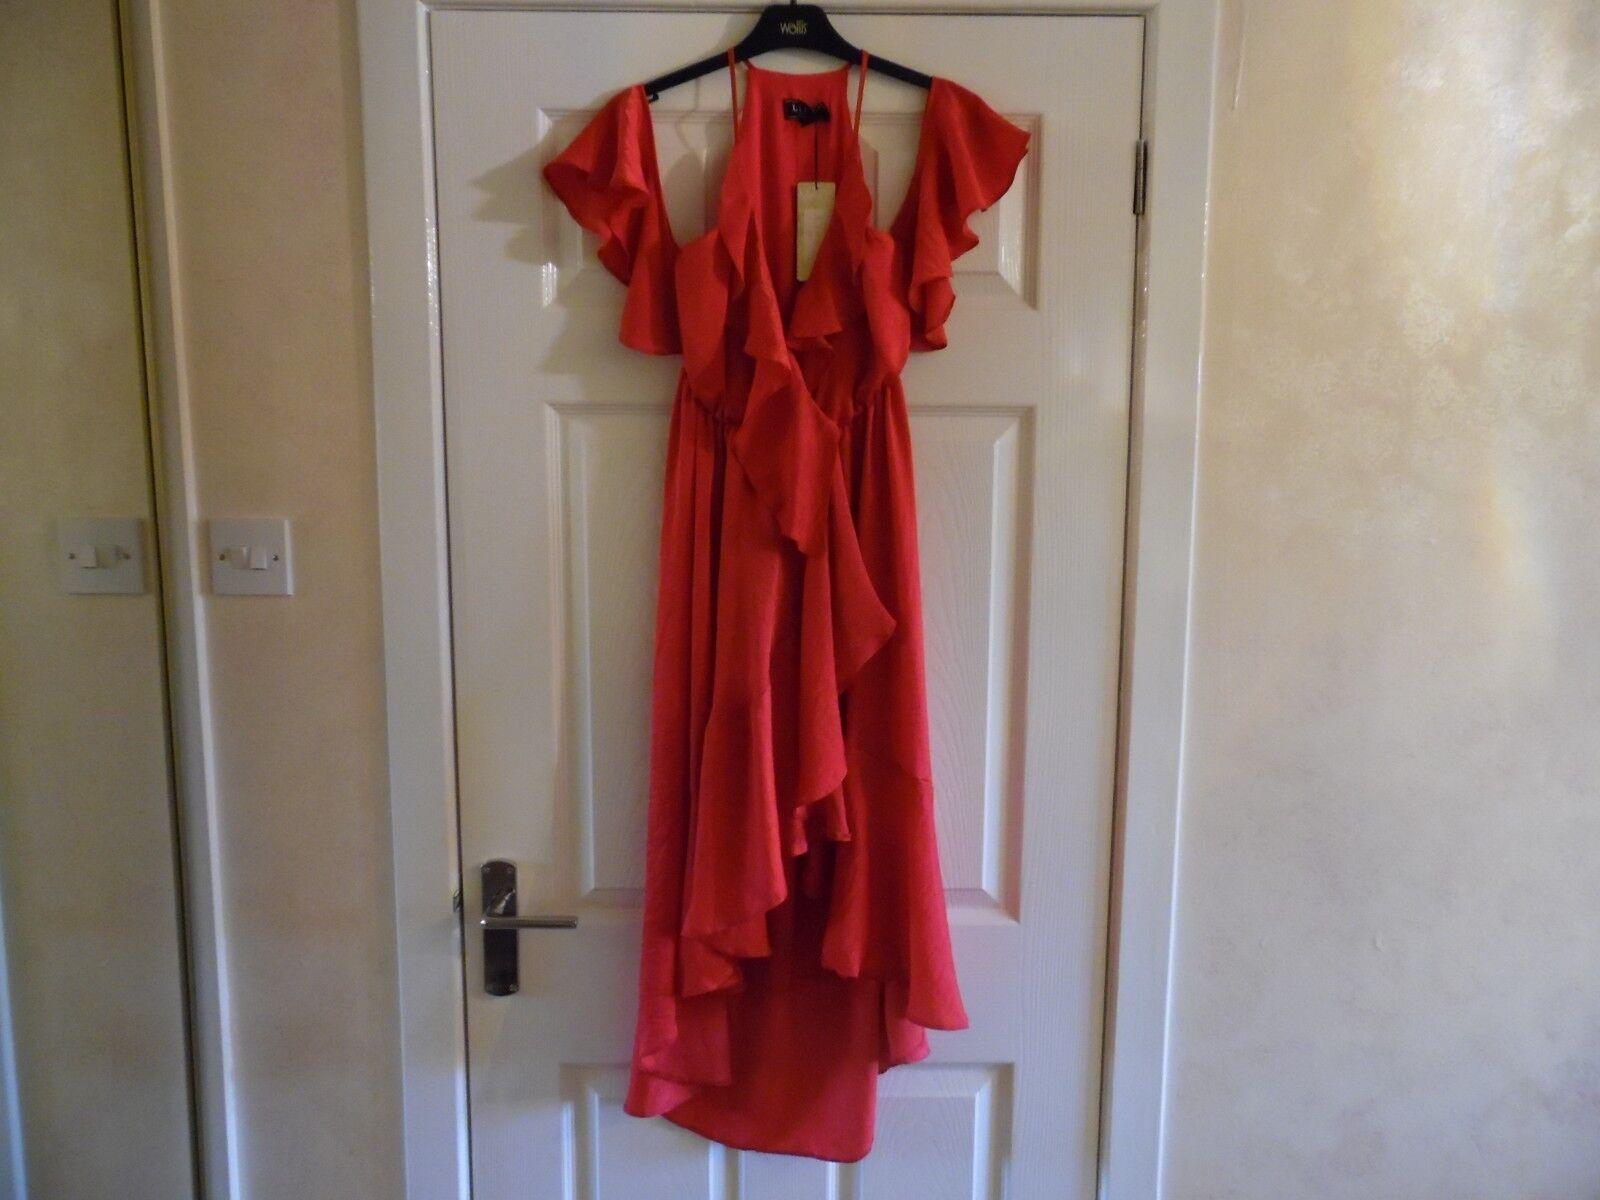 NEW  LIPSY FUSHIA RUFFLE COLD SHOULDER DRESS SIZE 8 - RRP  - BNWT